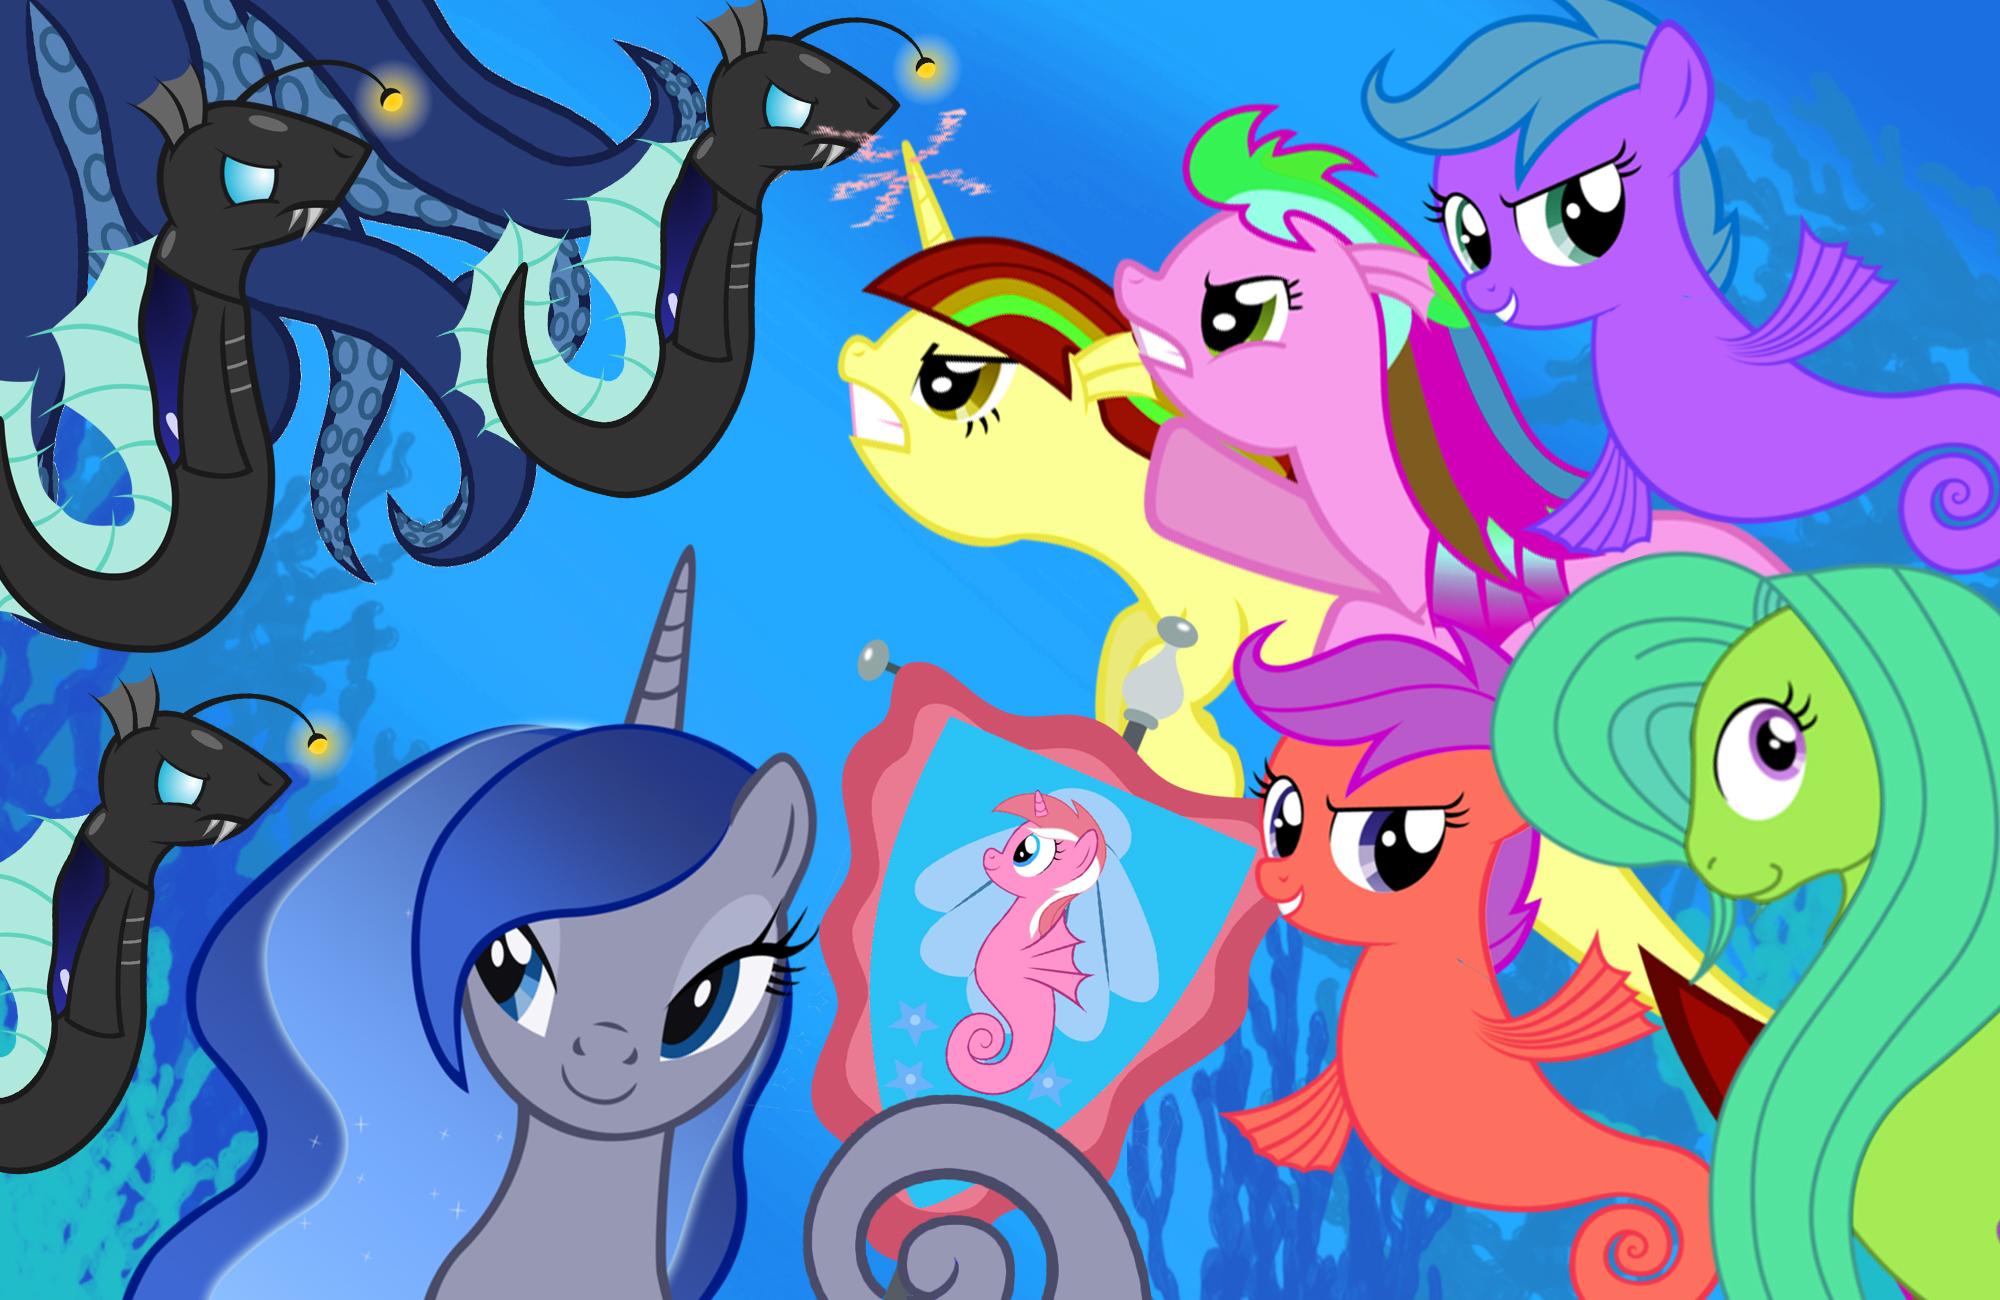 Drawn my little pony hippocampus In Pony! My by merponies